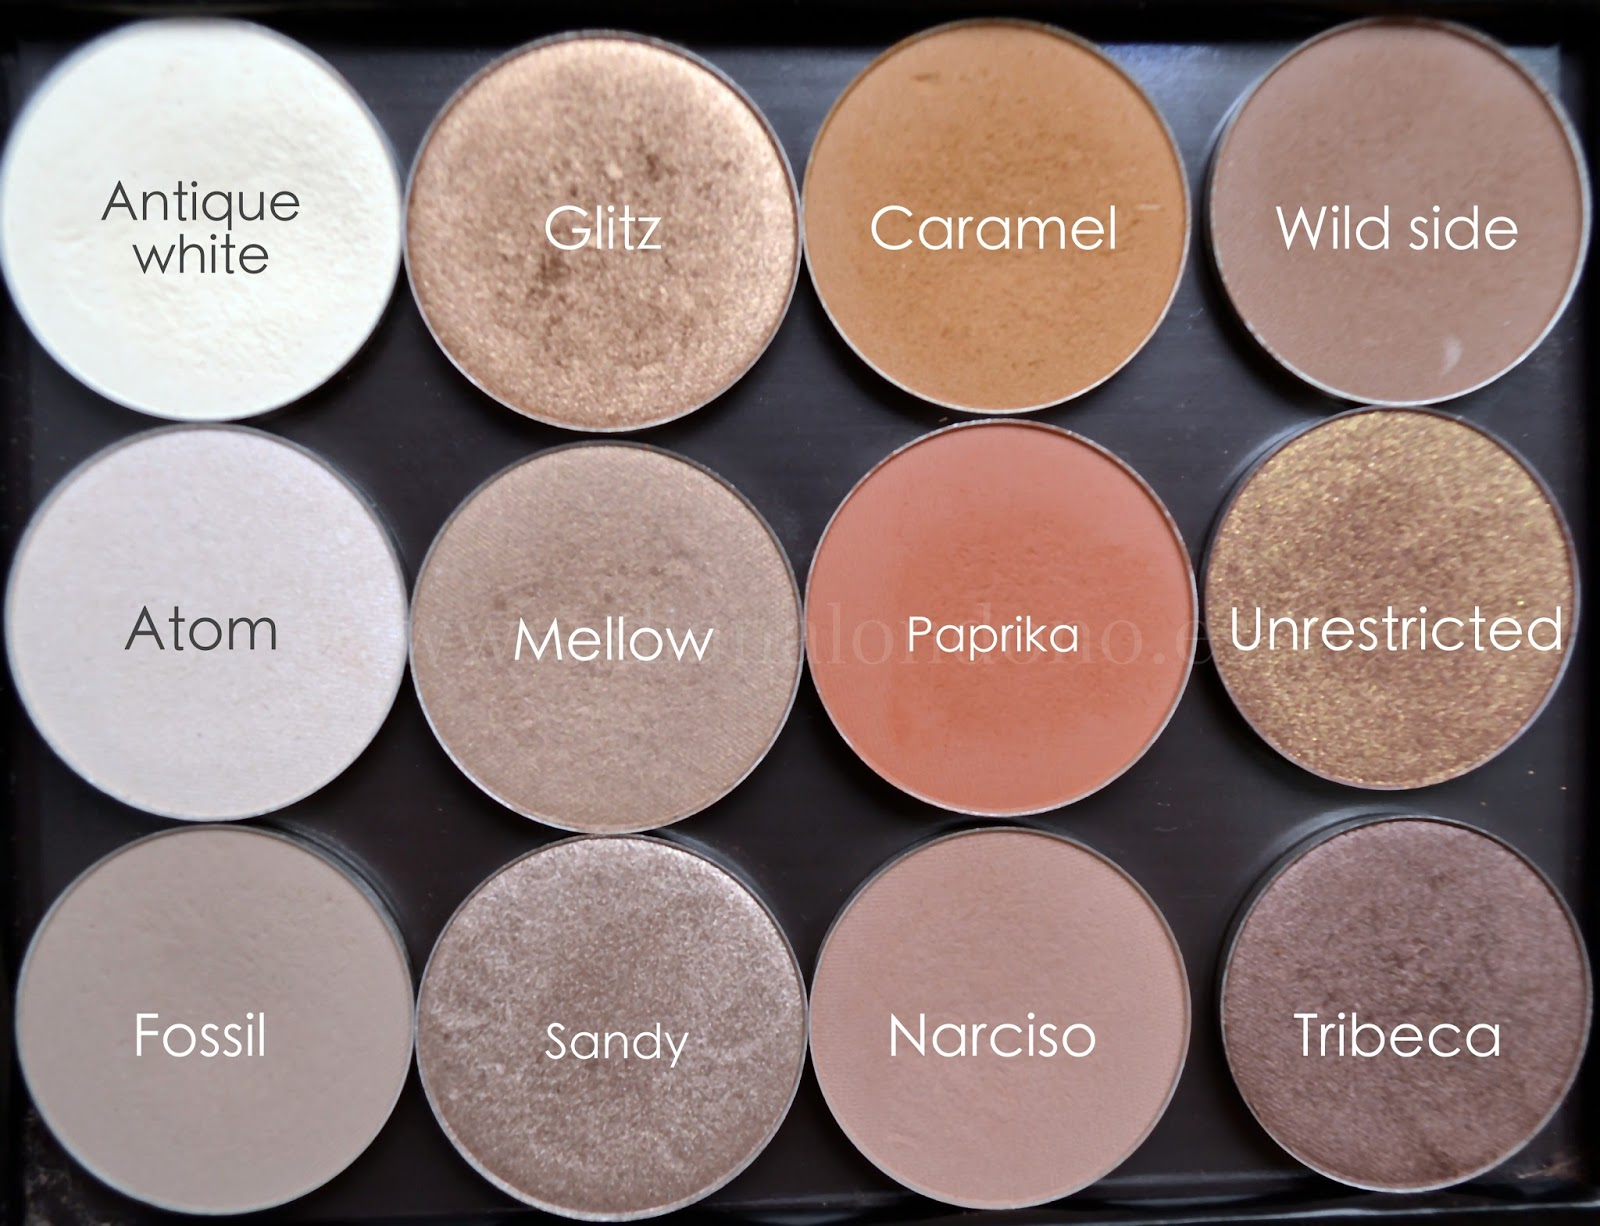 Paleta sombras de maquillaje tonos neutros Nabla cosmetcis